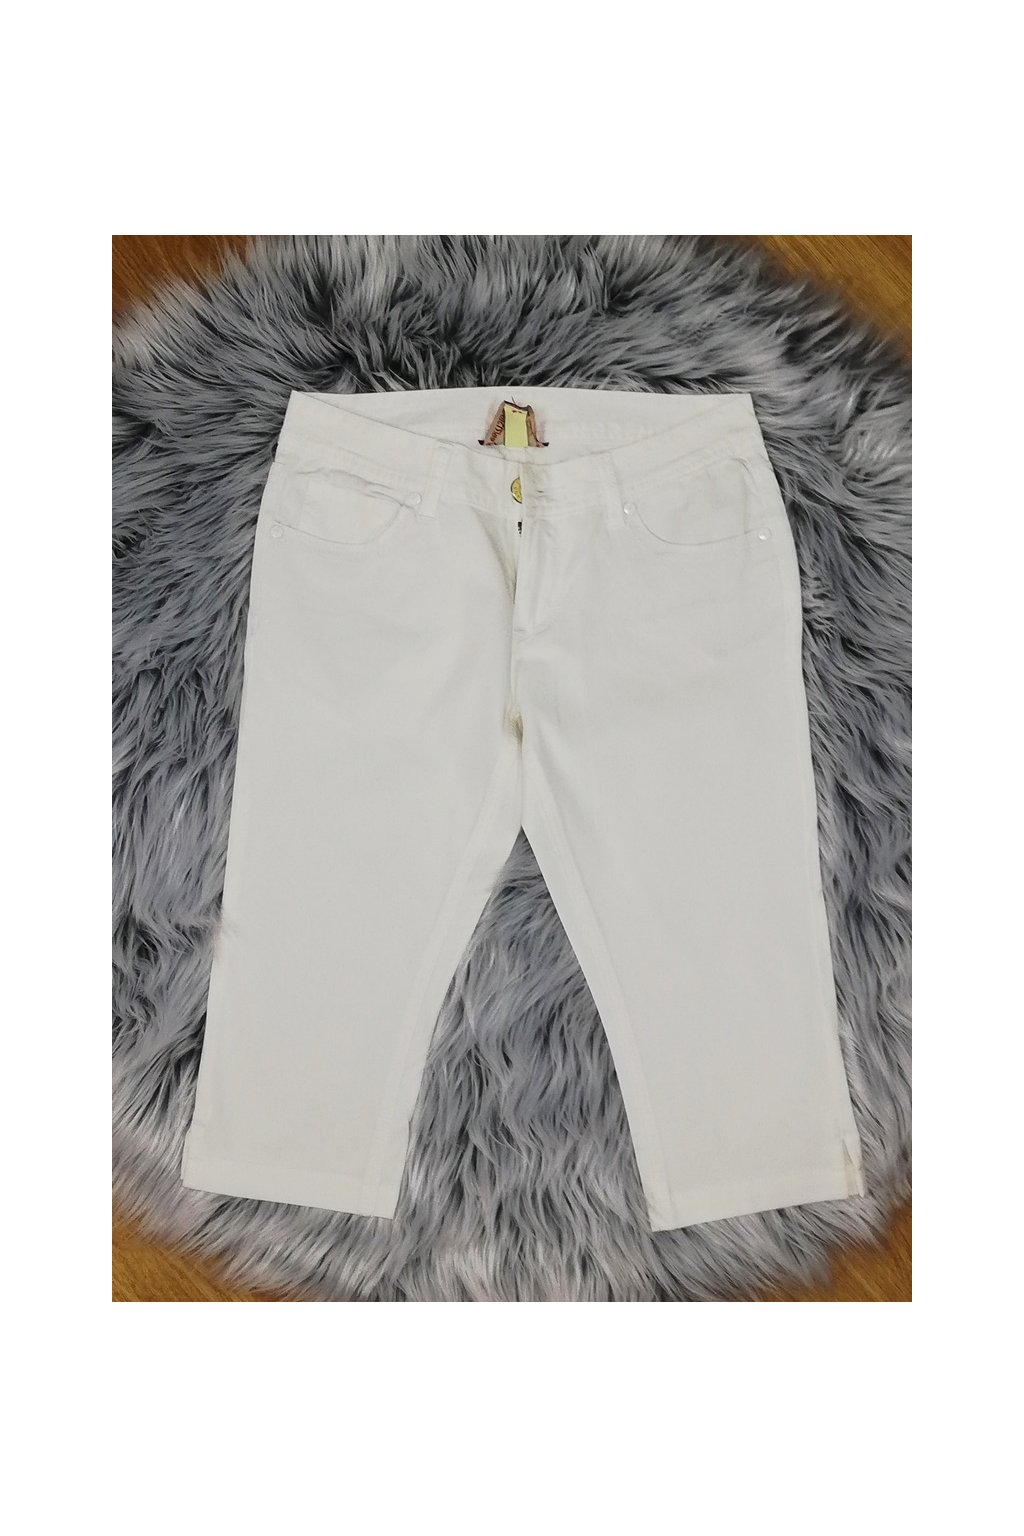 Dámske riflové kapri nohavice